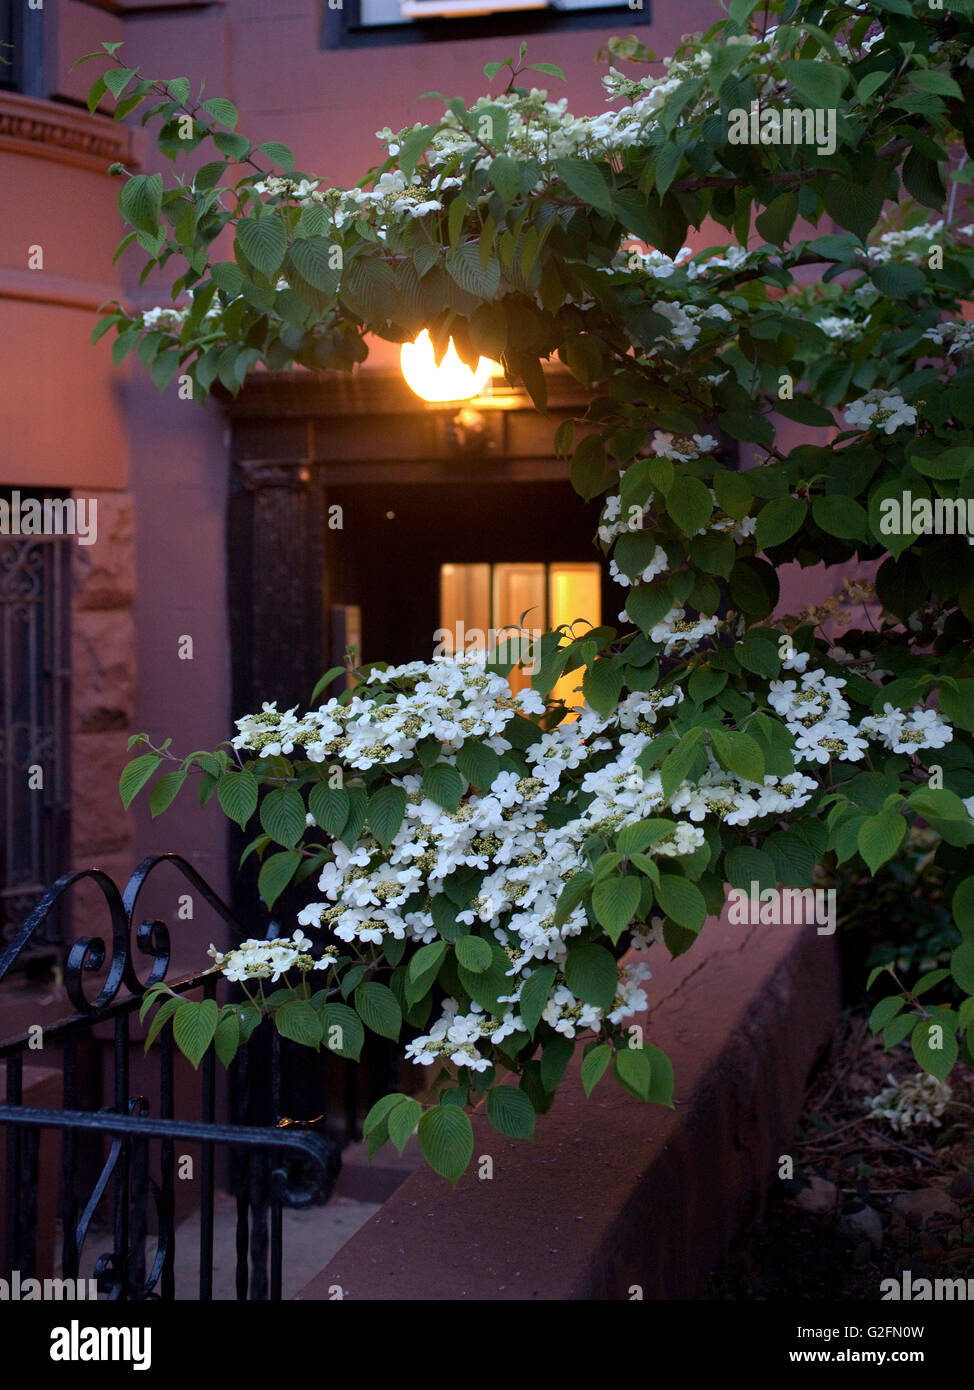 brooklyn spring morning dusk sunrise tee trees flowers bloom - Stock Image